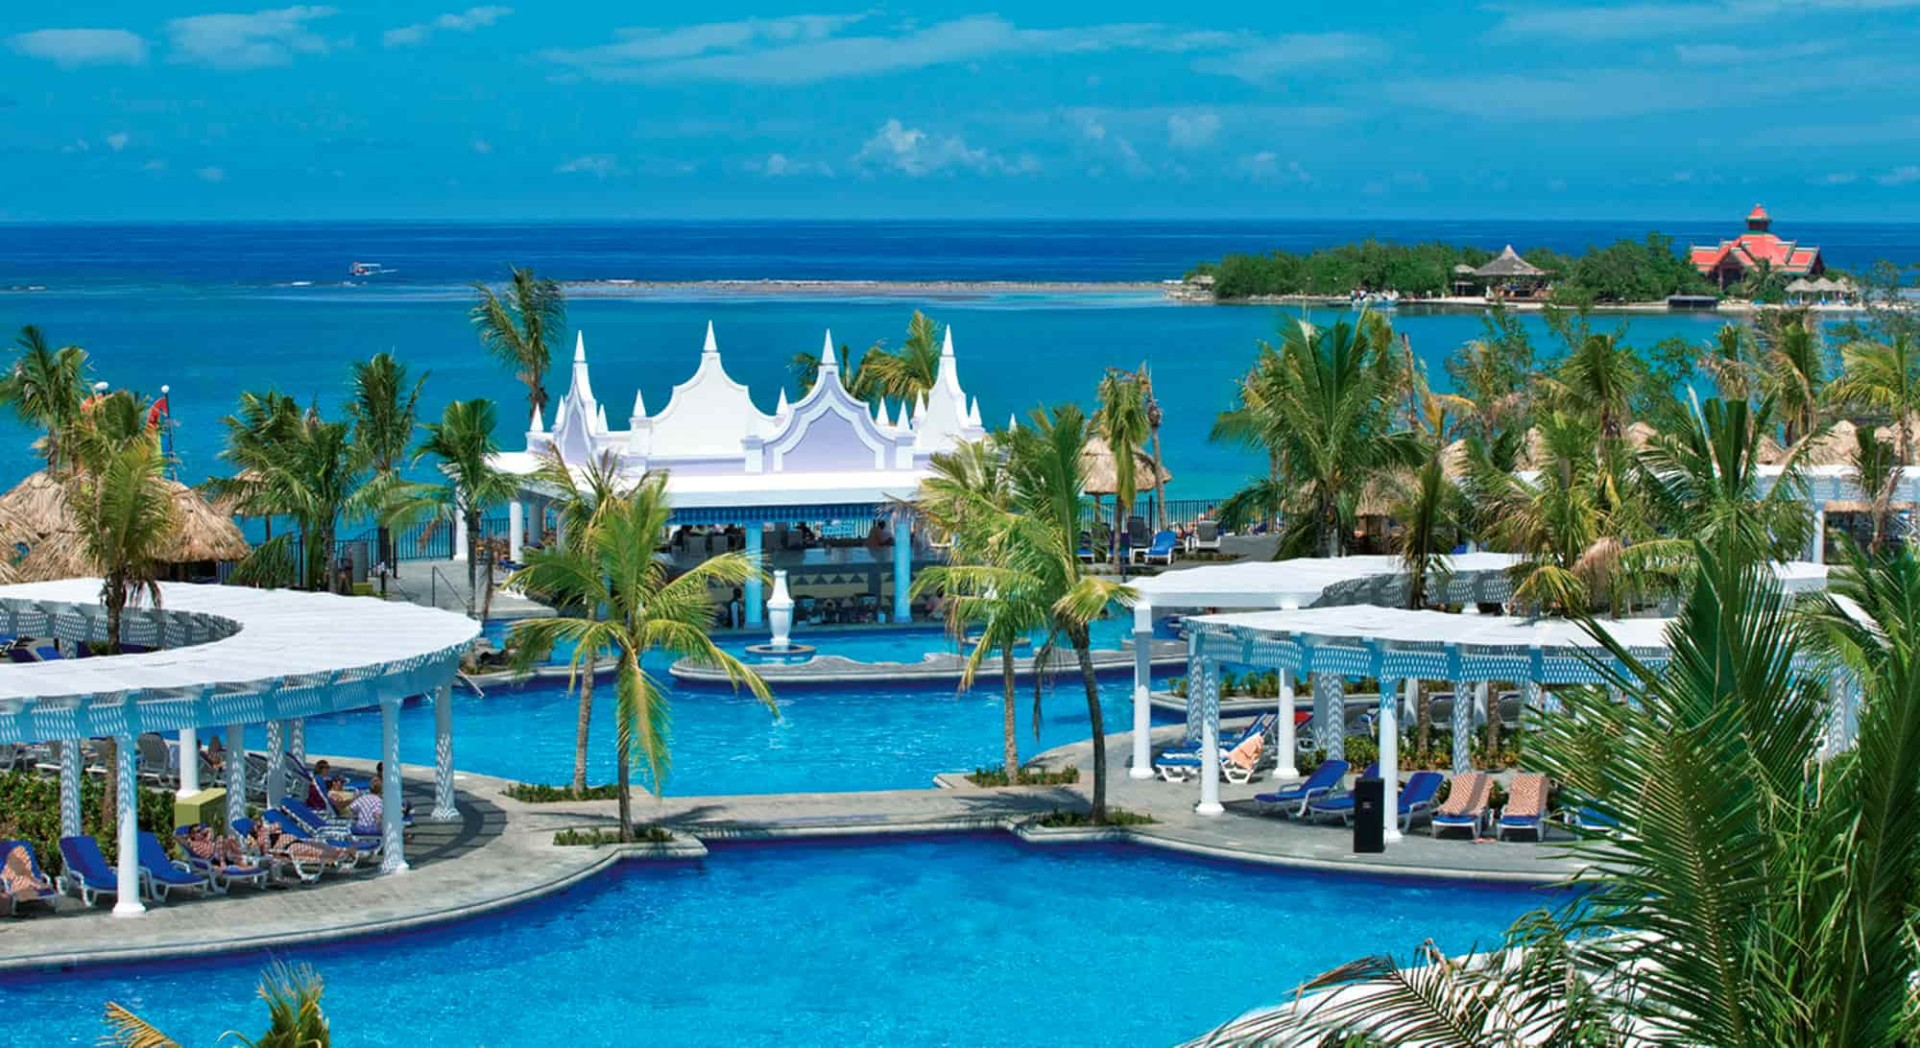 Top 10 Romantic AllInclusive Beach Resorts for Weddings